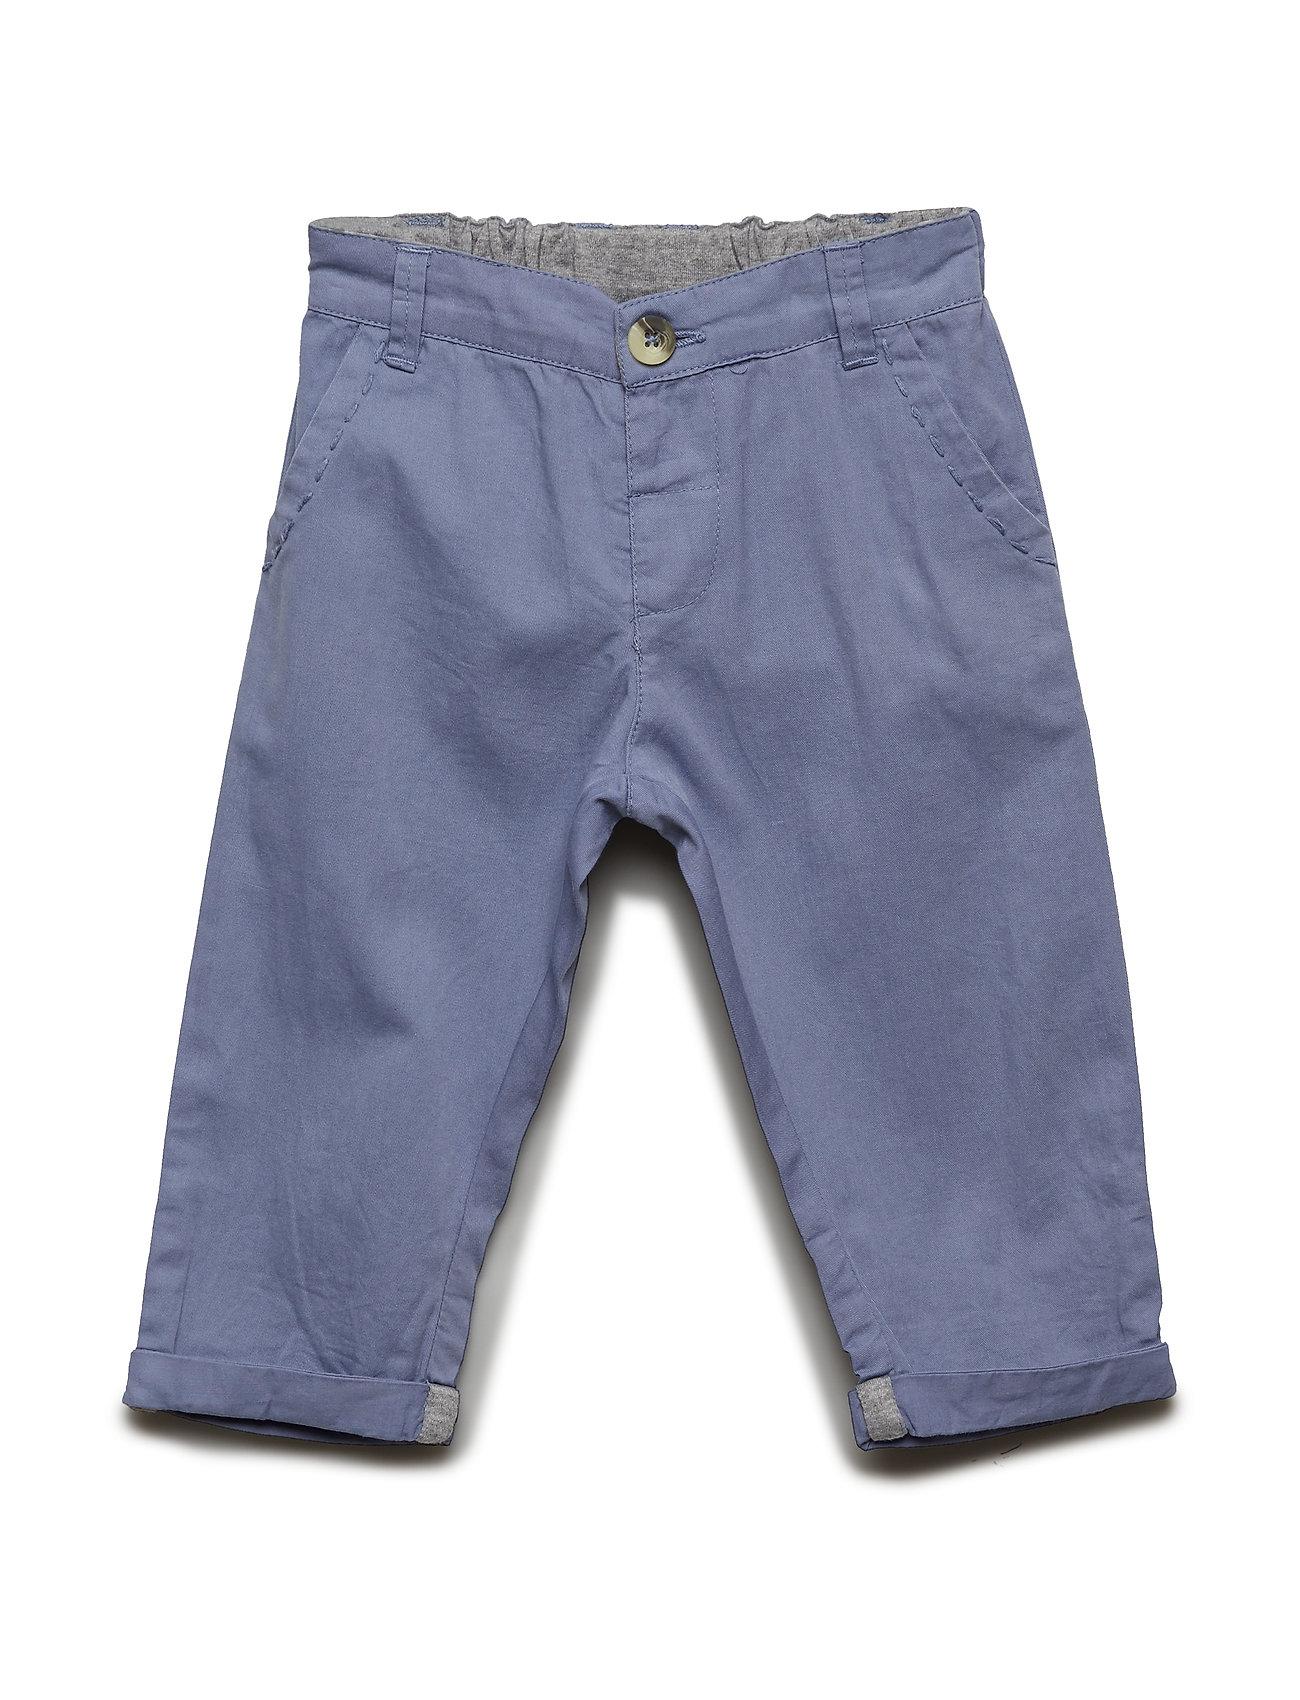 Image of Trousers Bukser Blå Noa Noa Miniature (3132349675)